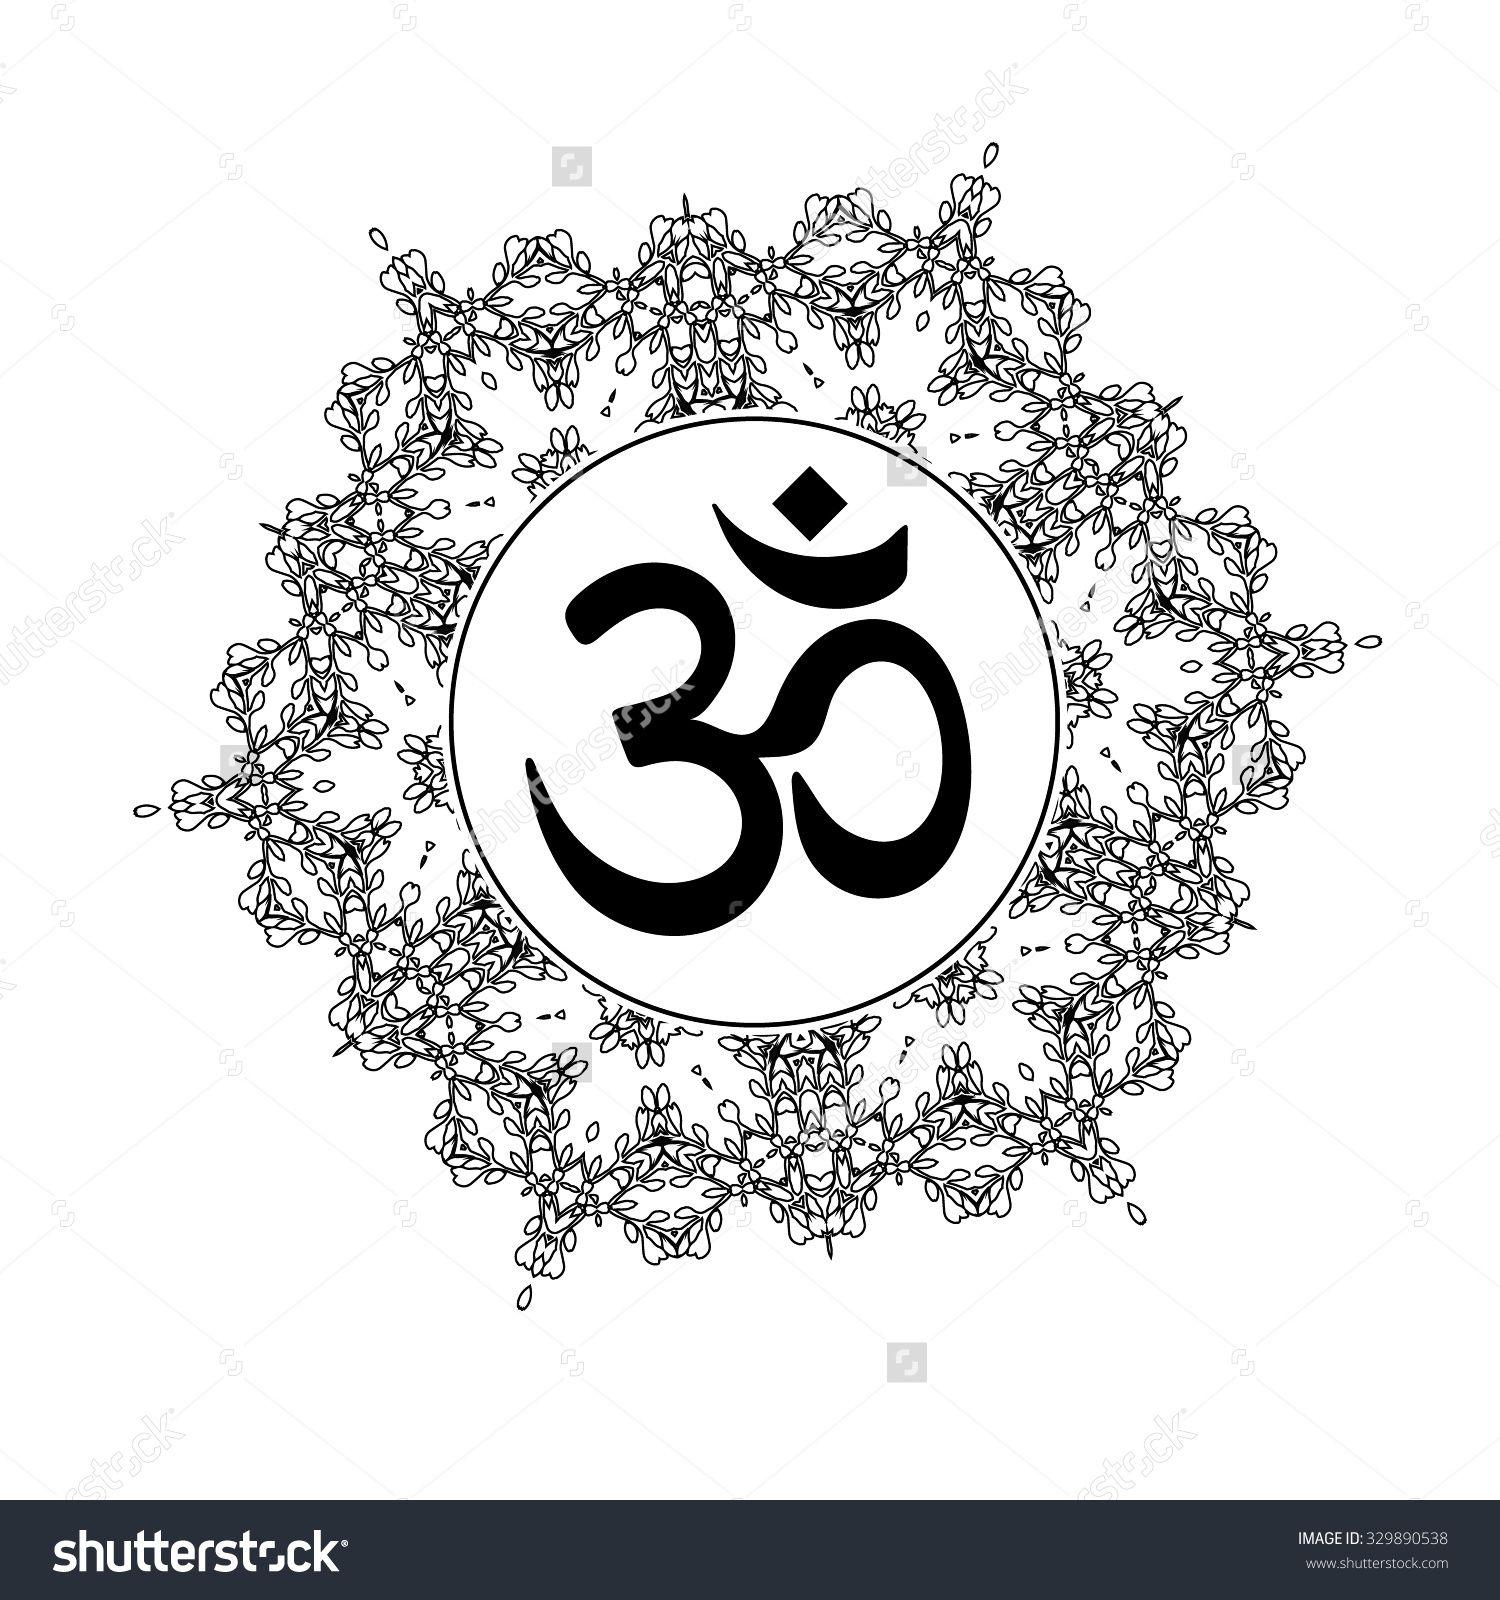 Diwali om symbol with mandala great design for tattoo yoga diwali om symbol with mandala great design for tattoo yoga studio spirituality concepts buycottarizona Gallery